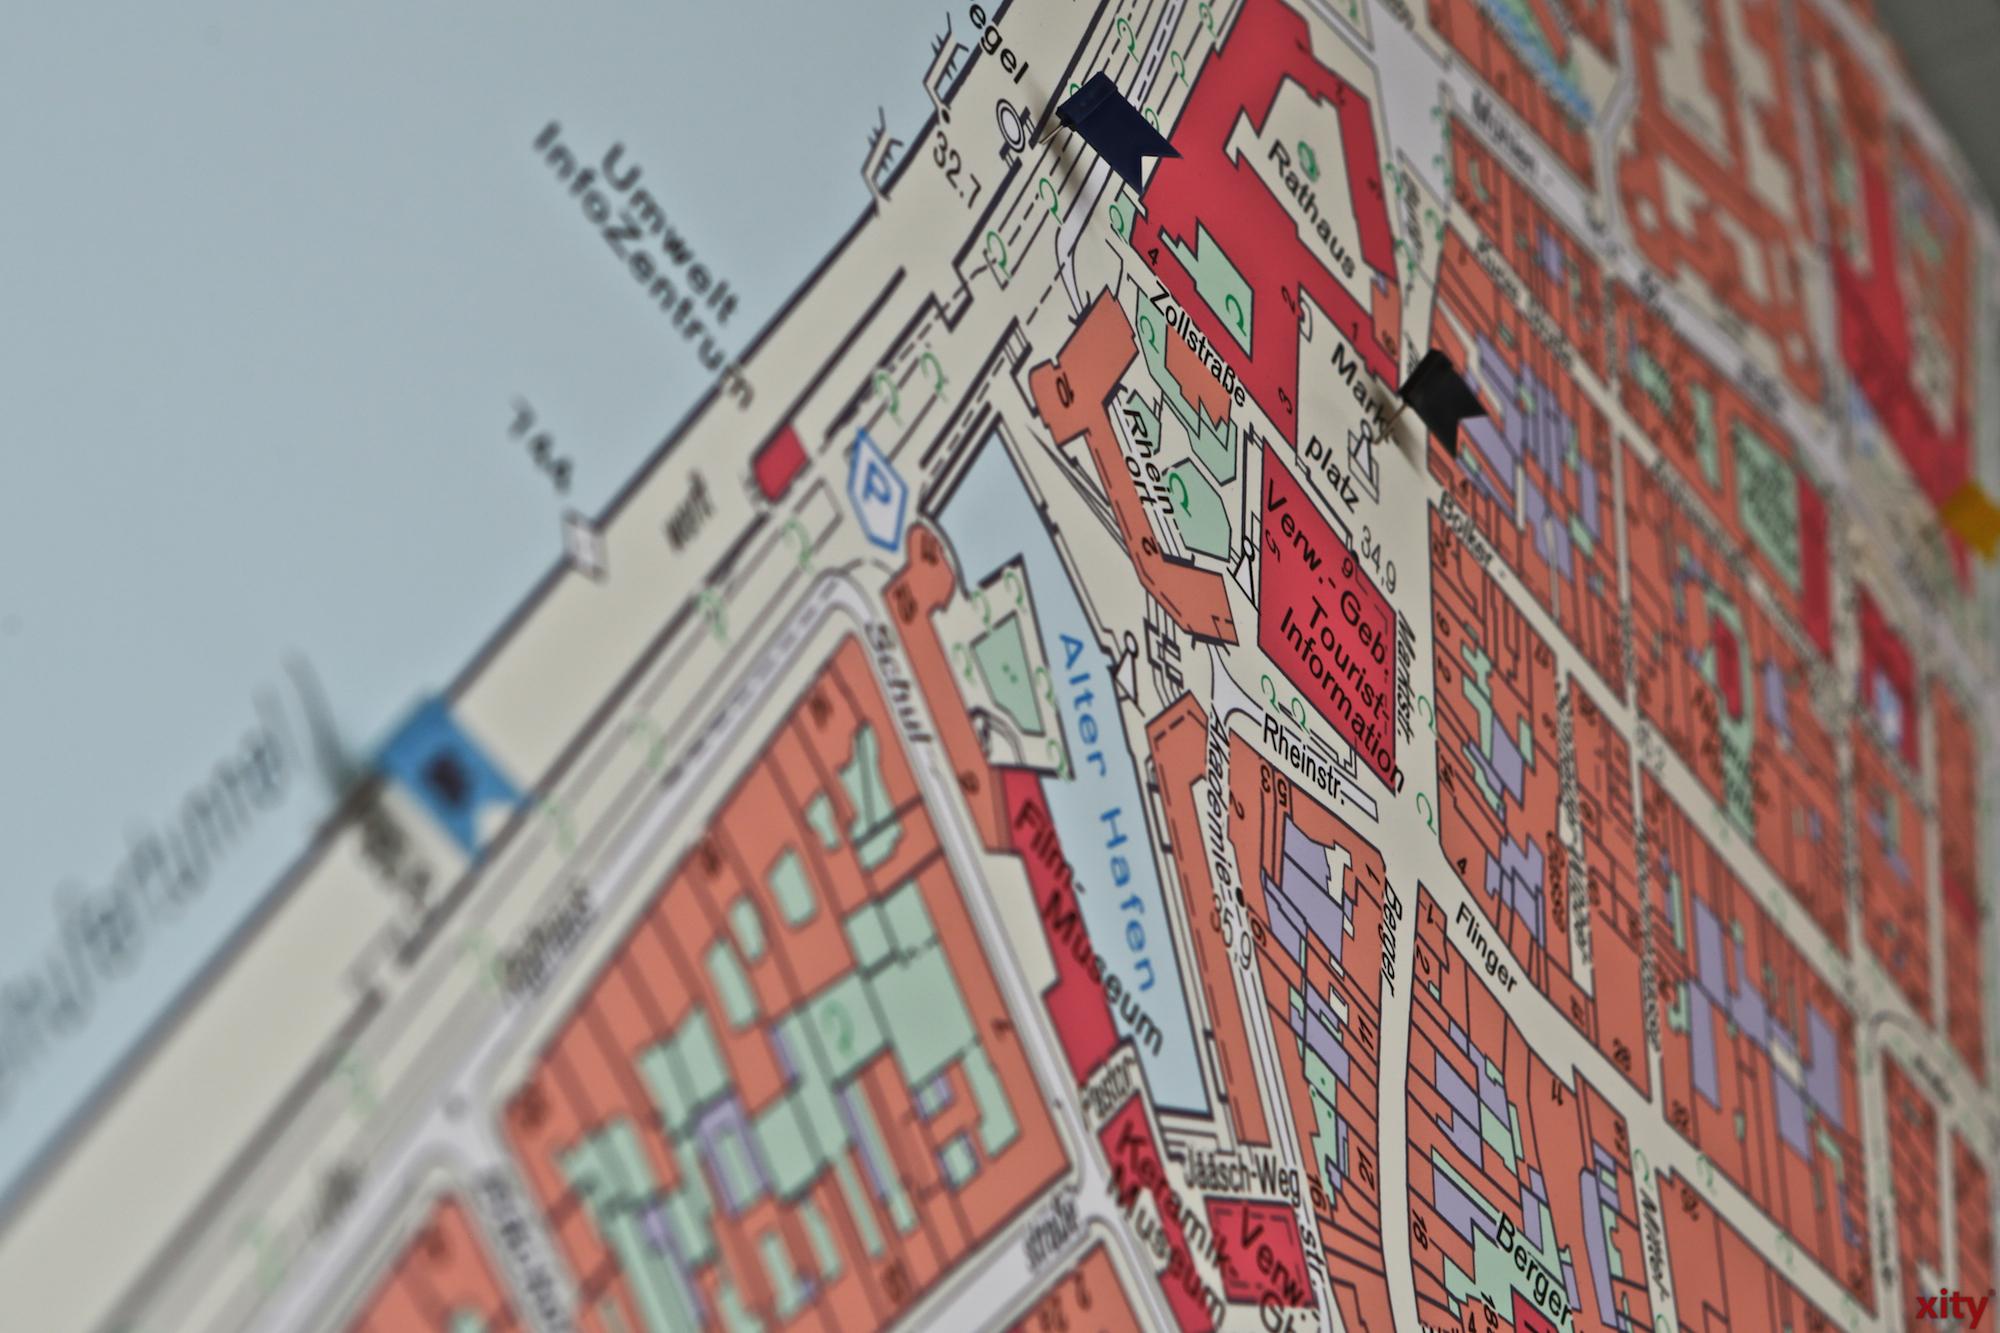 Die Altstadt wird zum Hot-Spot (Foto: xity)